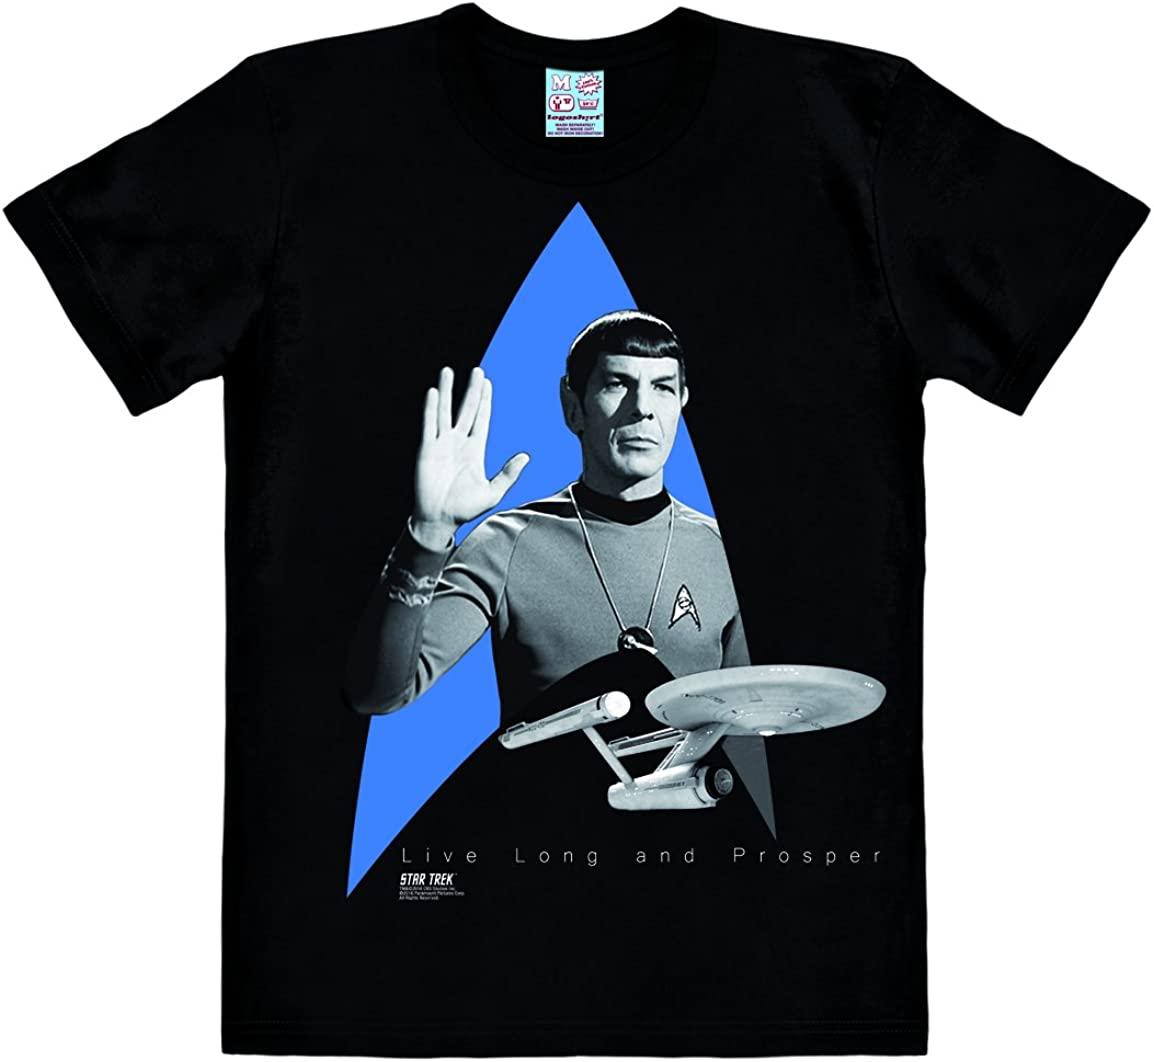 Spock Enterprise T-Shirt Uomo Design Originale Concesso su Licenza Logoshirt Star Trek Nero USS Enterprise Logo